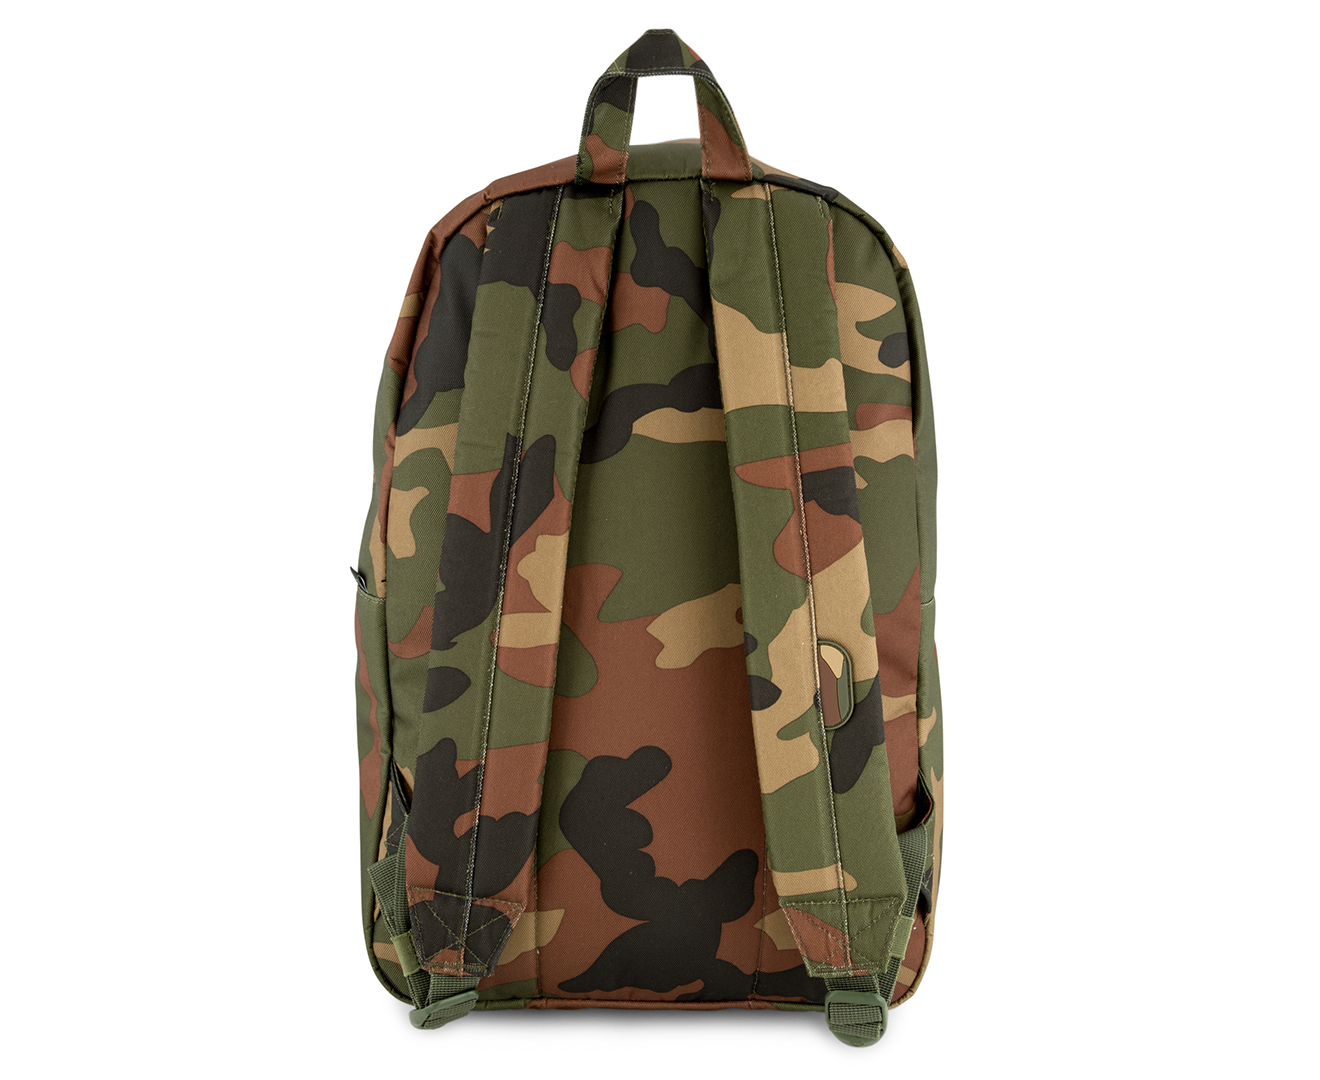 95d11ff69b Herschel Supply Co. 21.5L Heritage Backpack - Woodland Camo